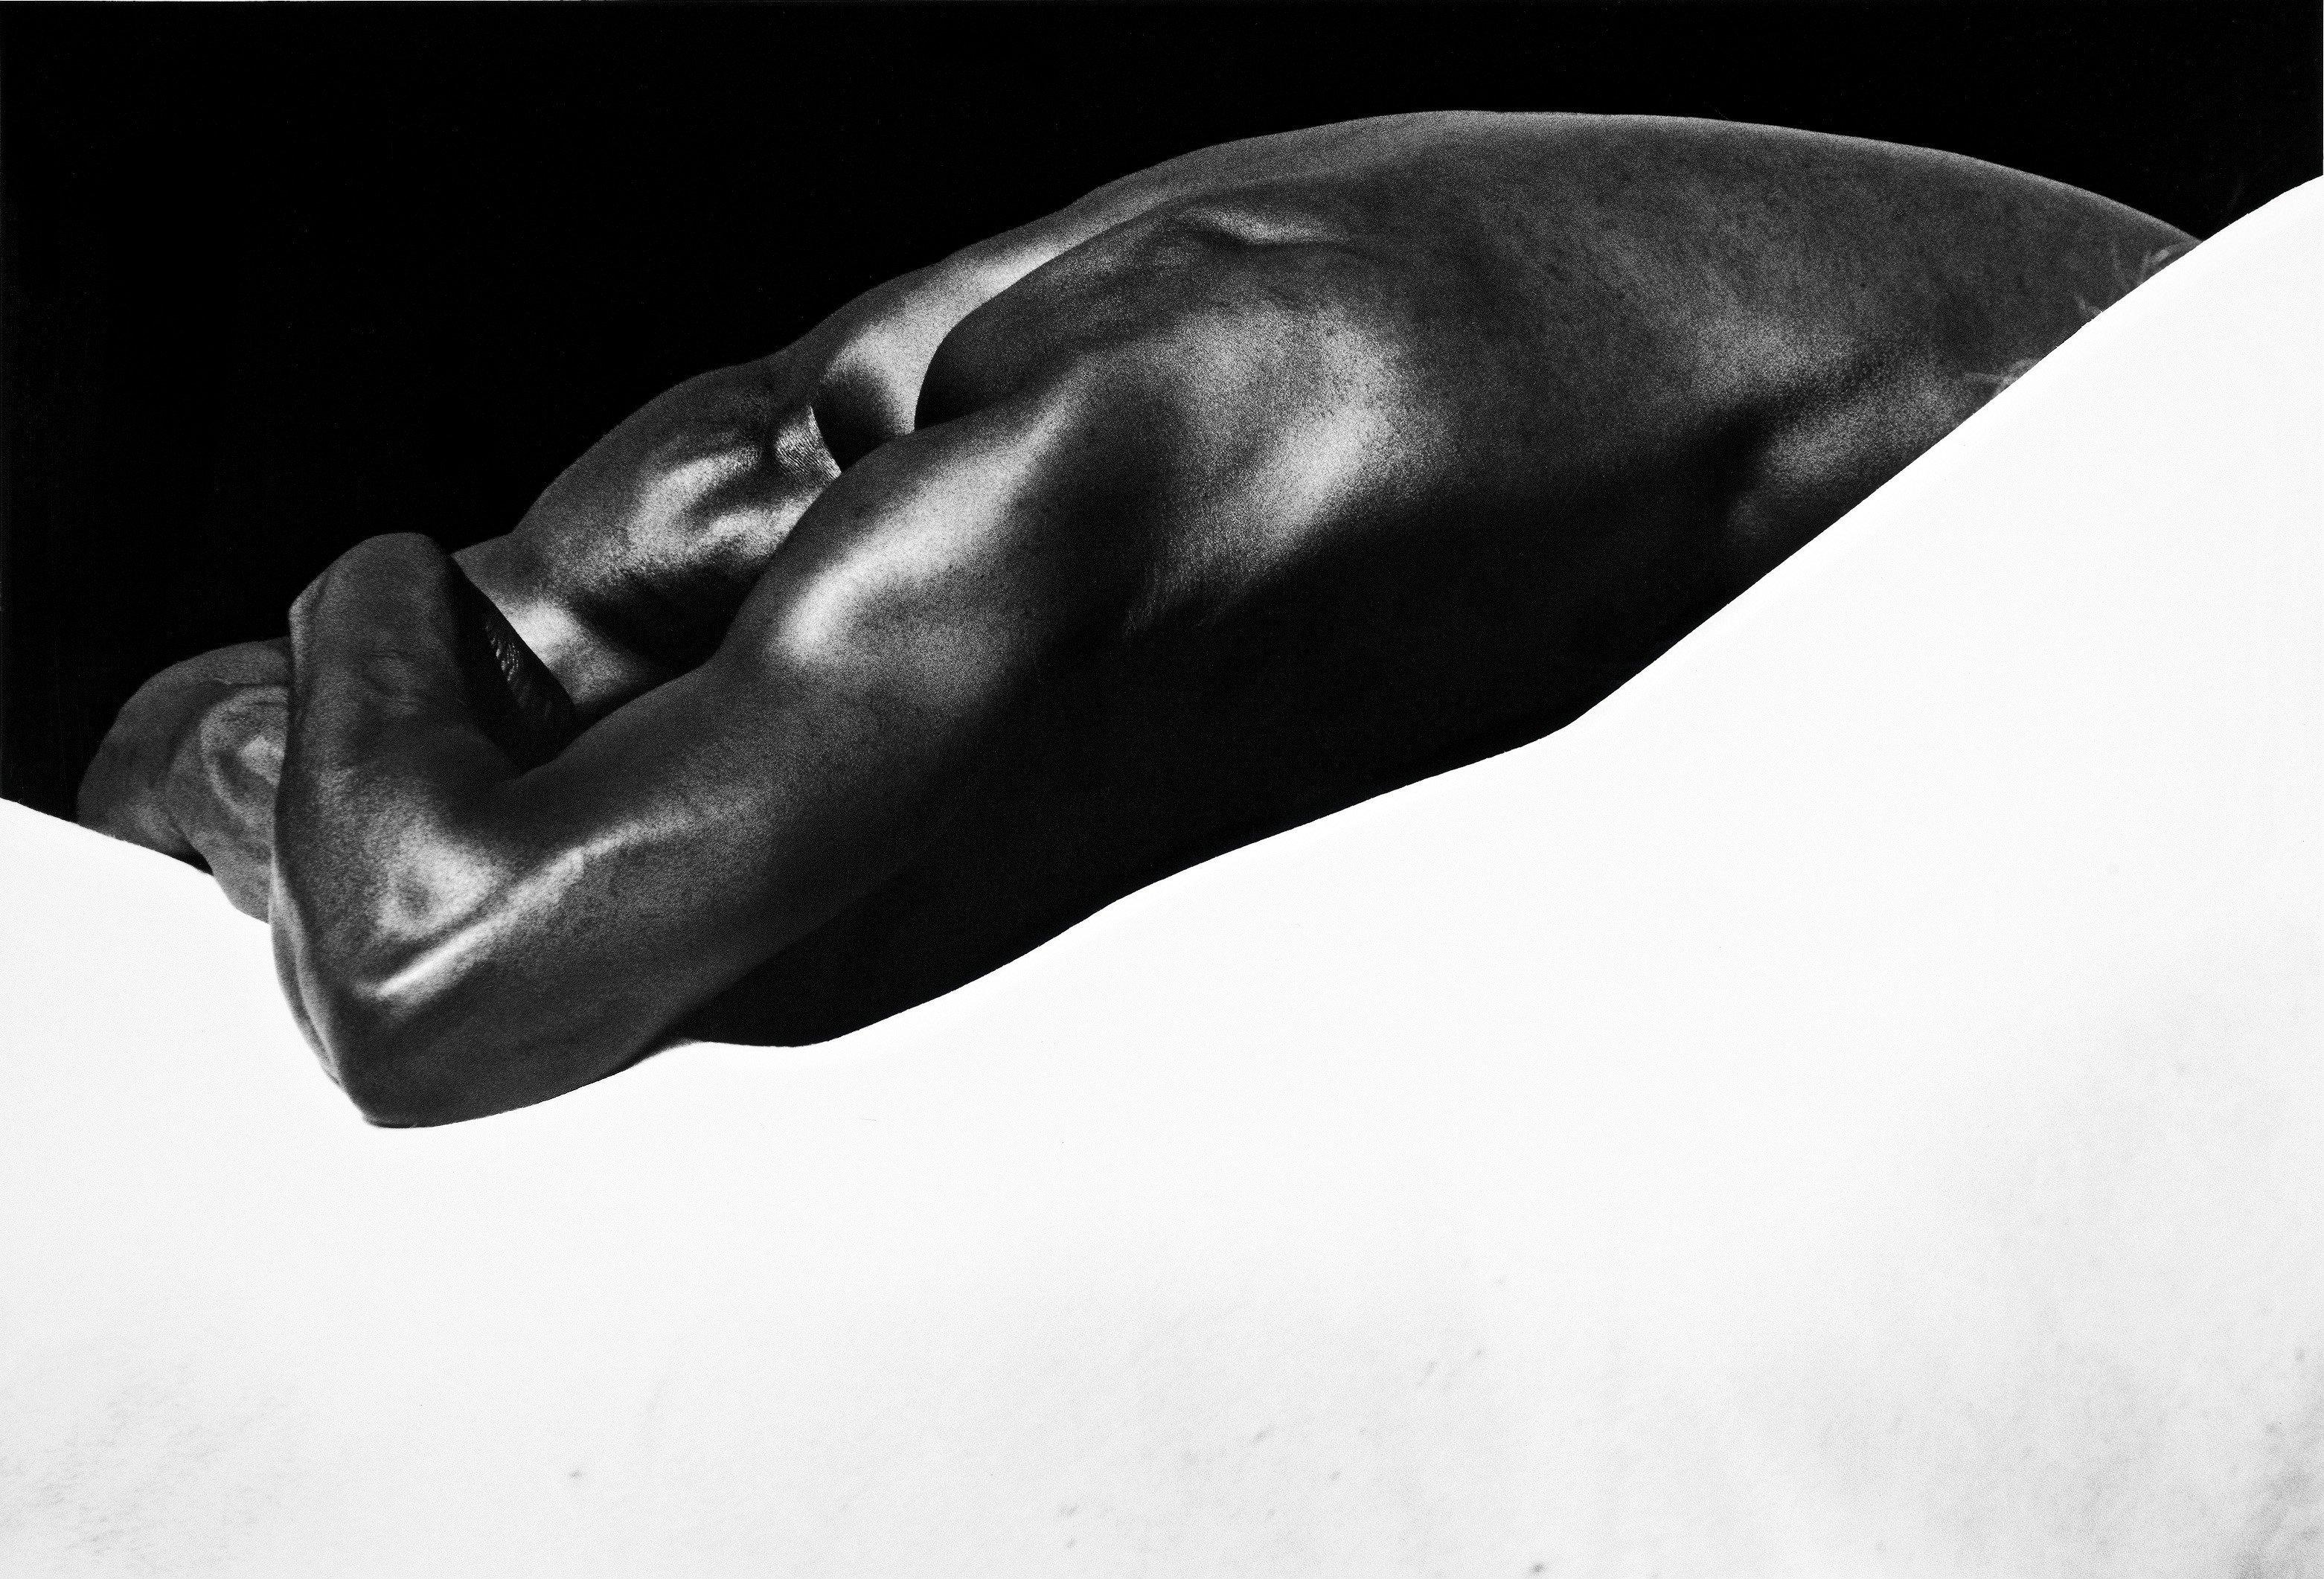 Laurent Elie Badessi Man s Back  Horse s Back  Camargue  France 'La bellesa de les línies' Foto Colectània  1994 (C) Laurent Elie Badessi